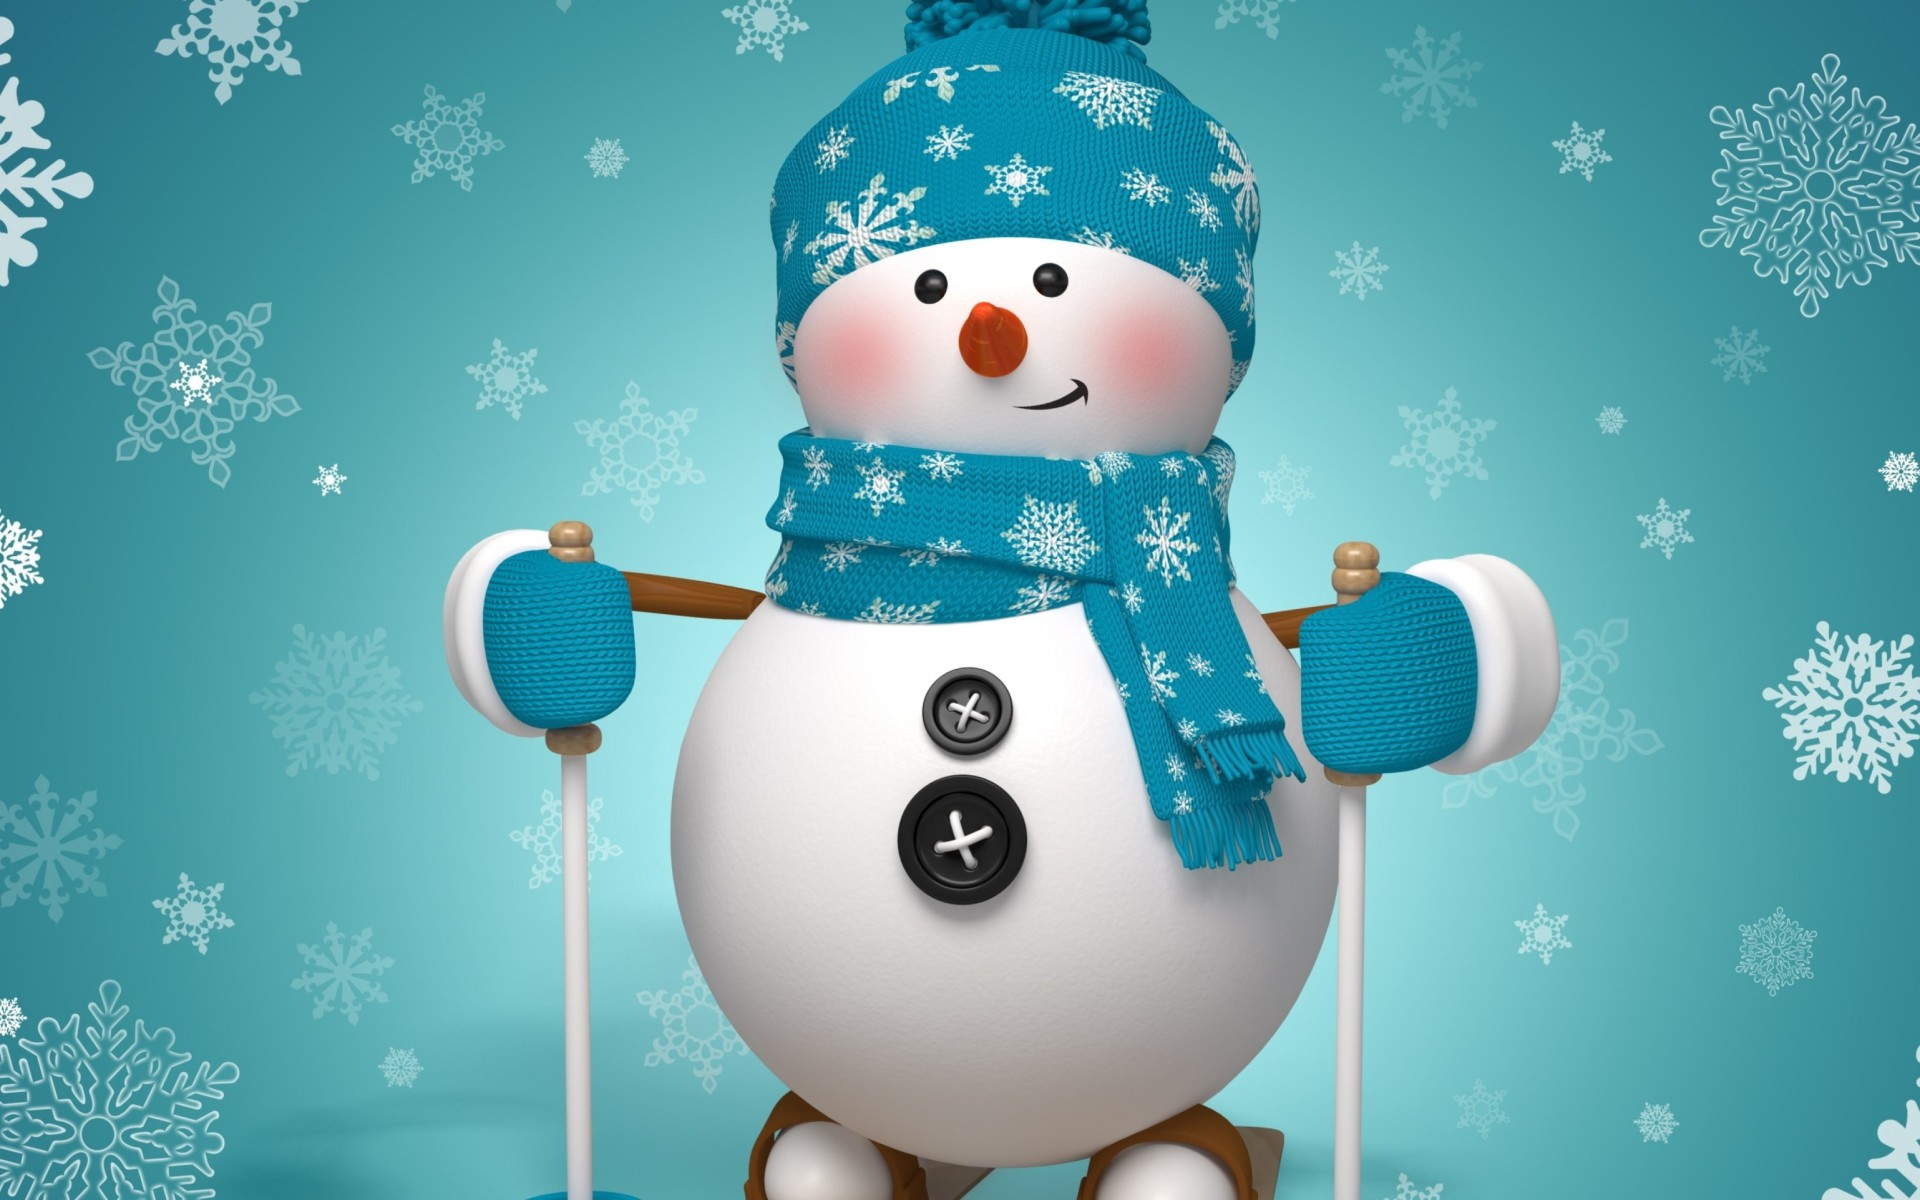 cute snowman wallpaper 183��